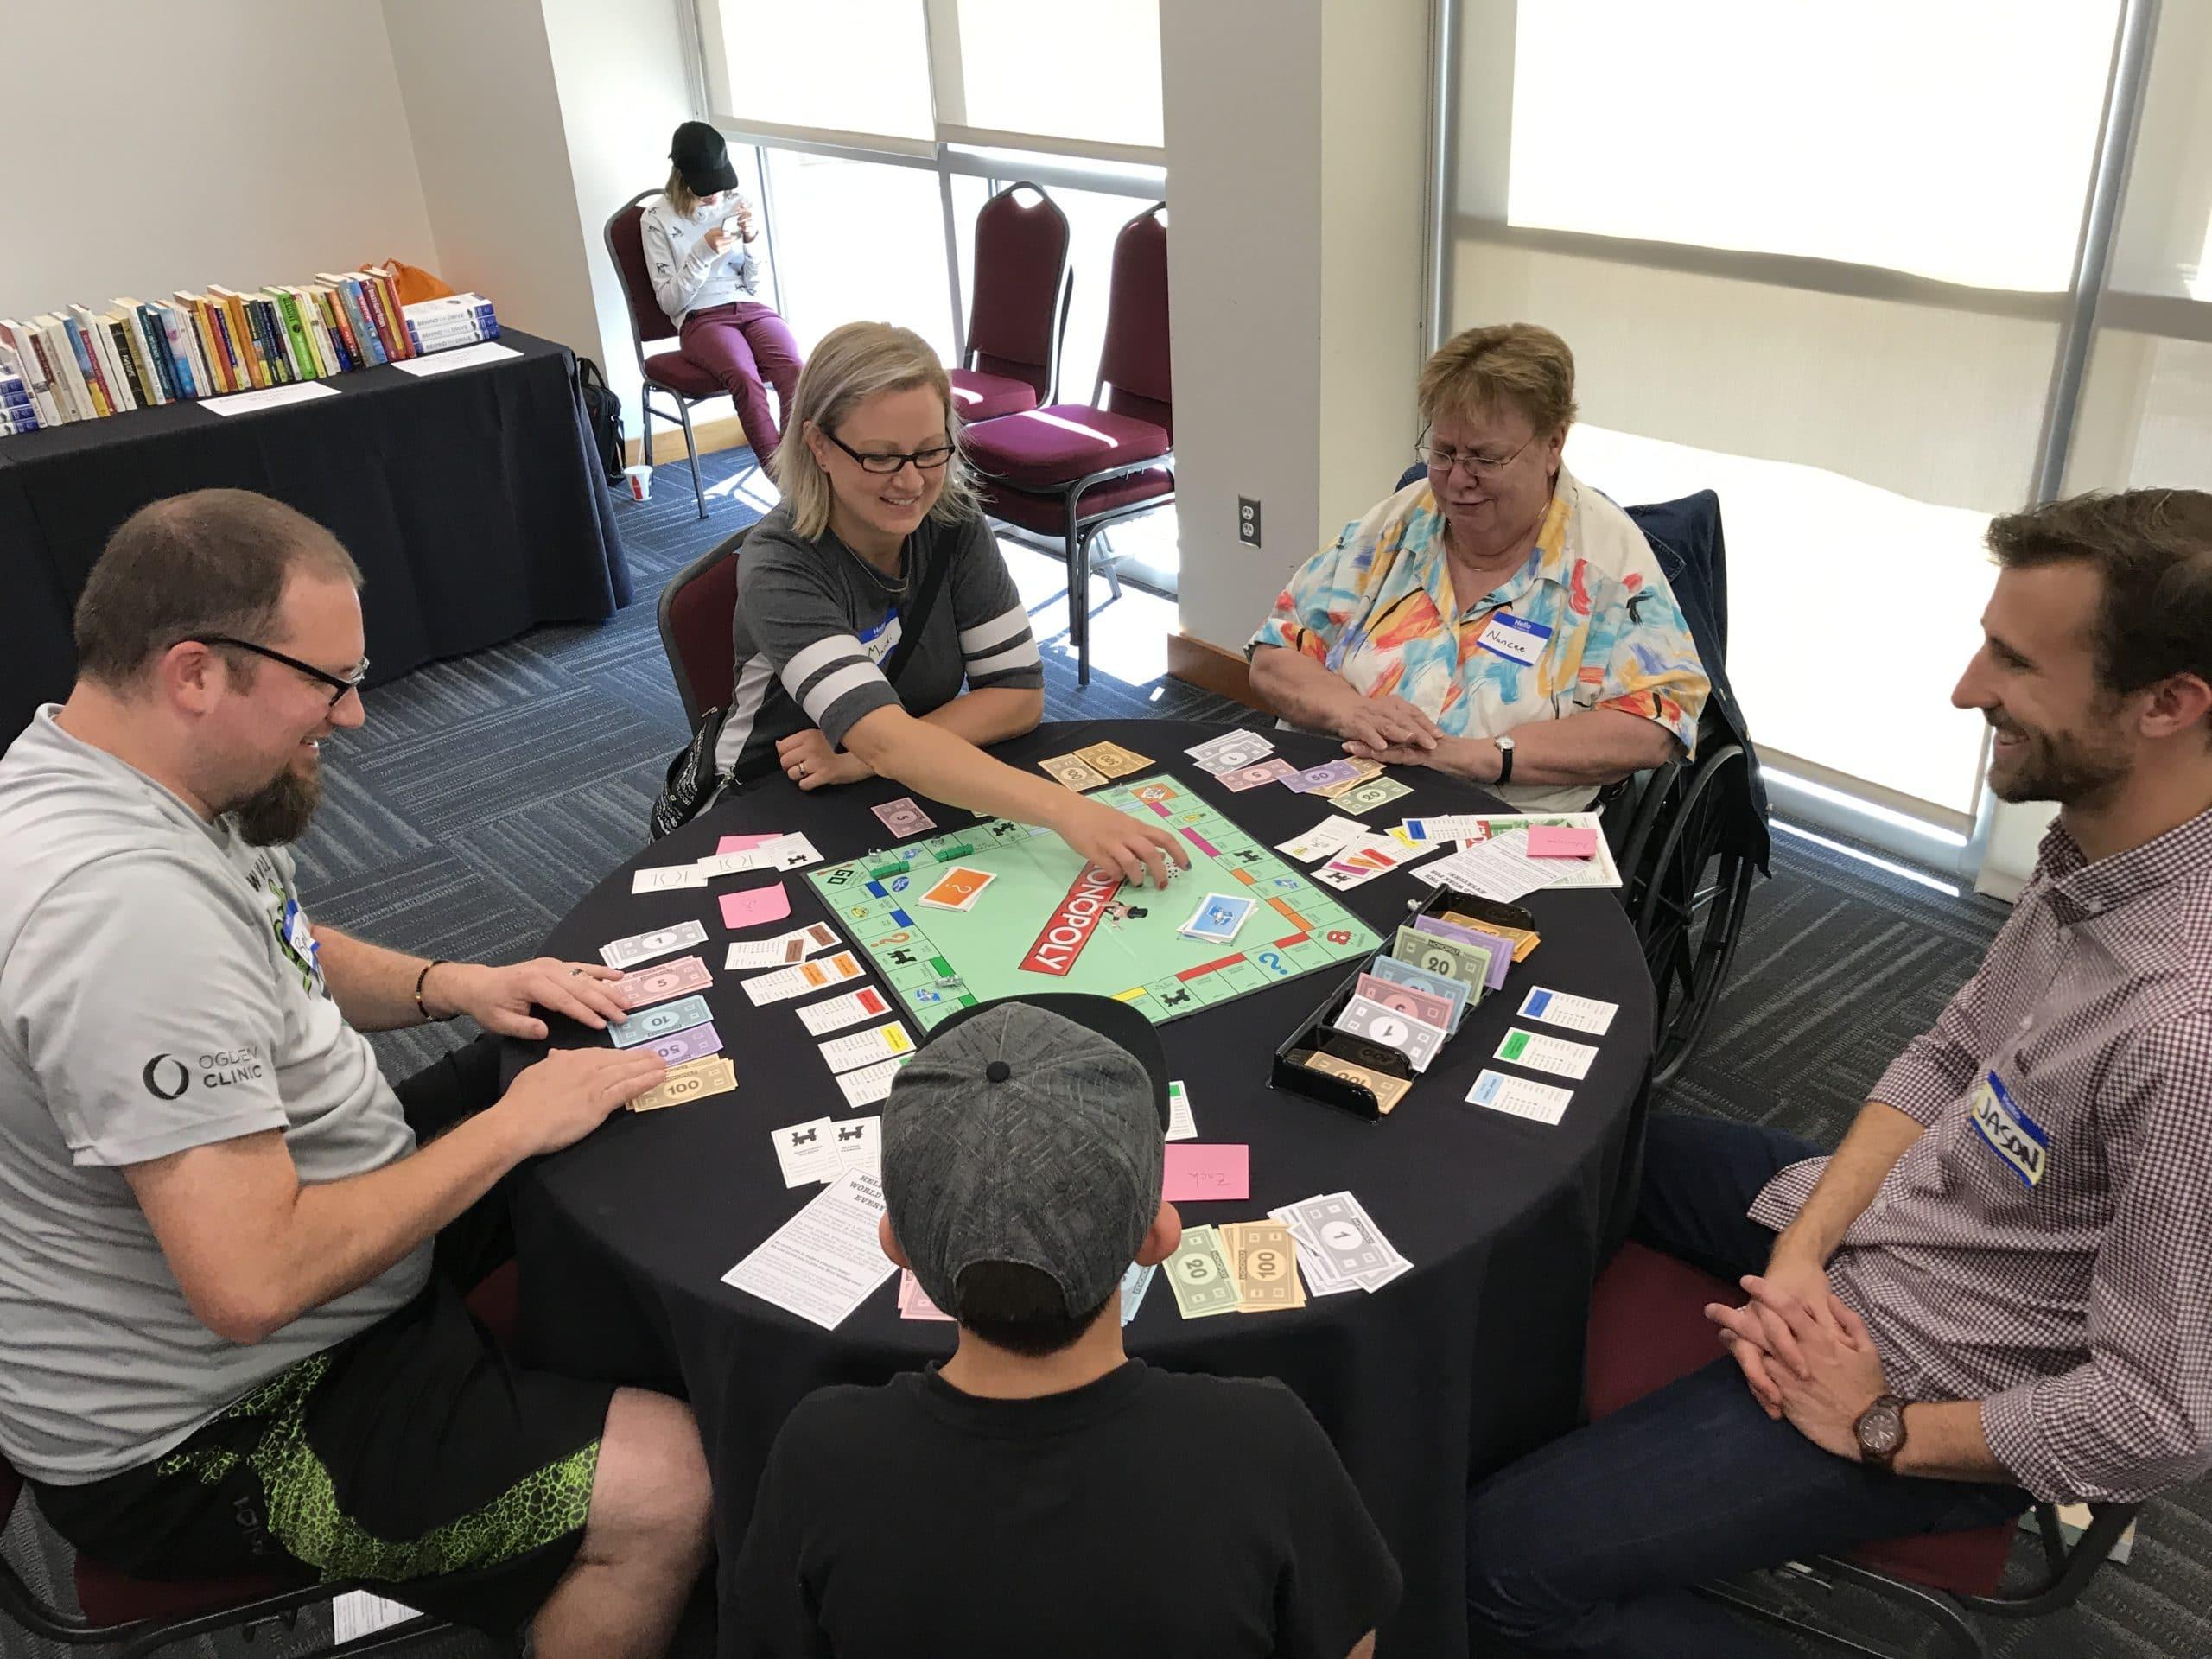 Nancee Playing Monopoly